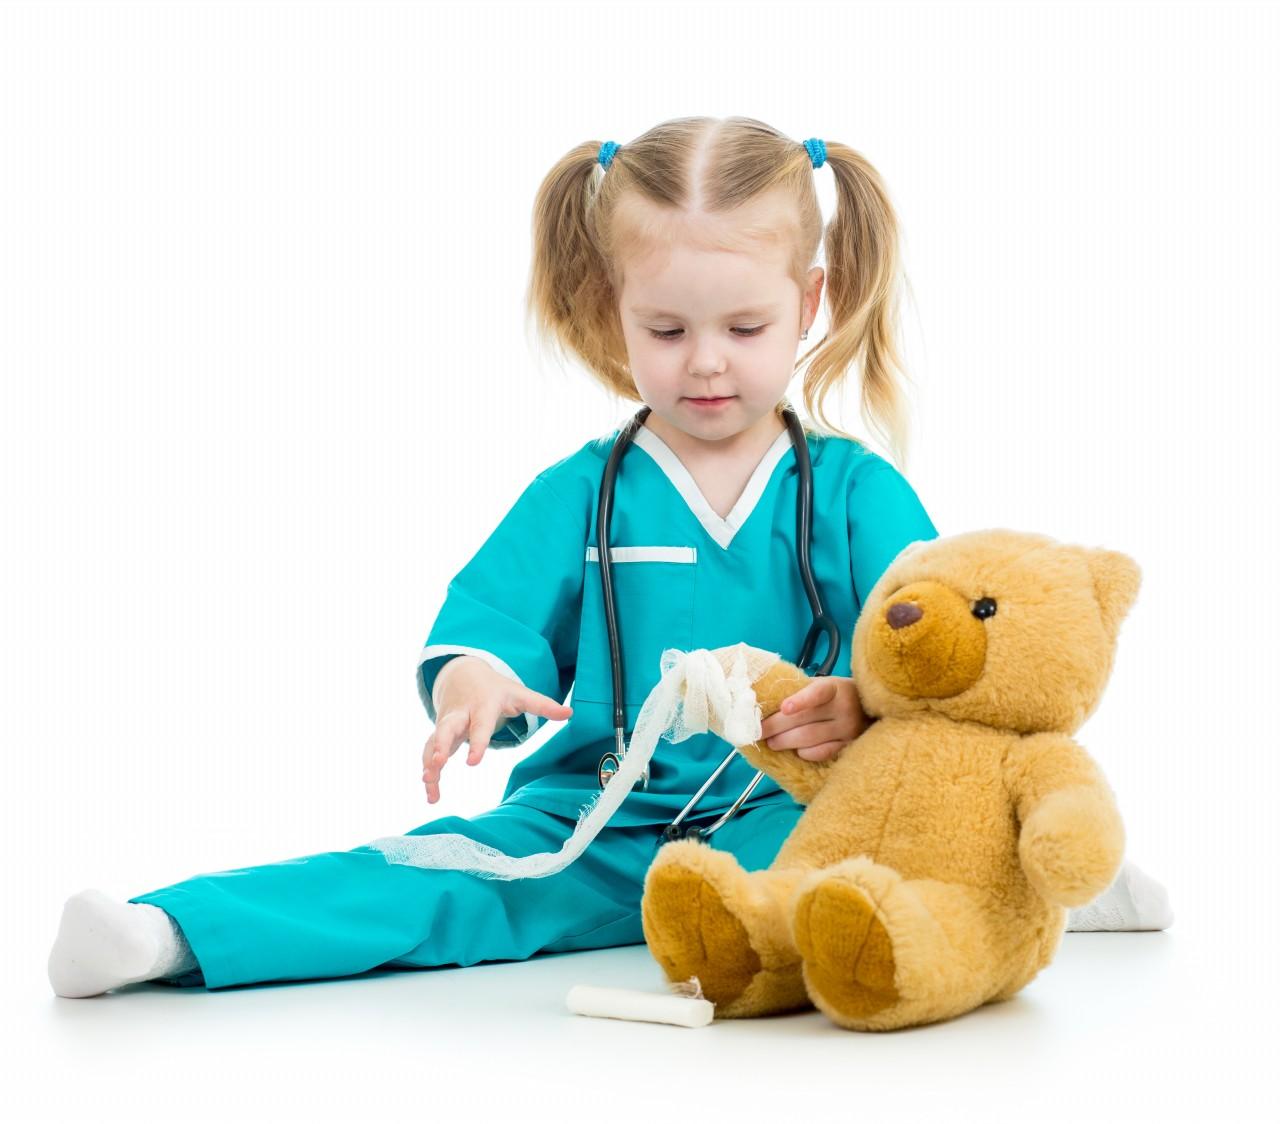 doctor kid Kid girl playing doctor